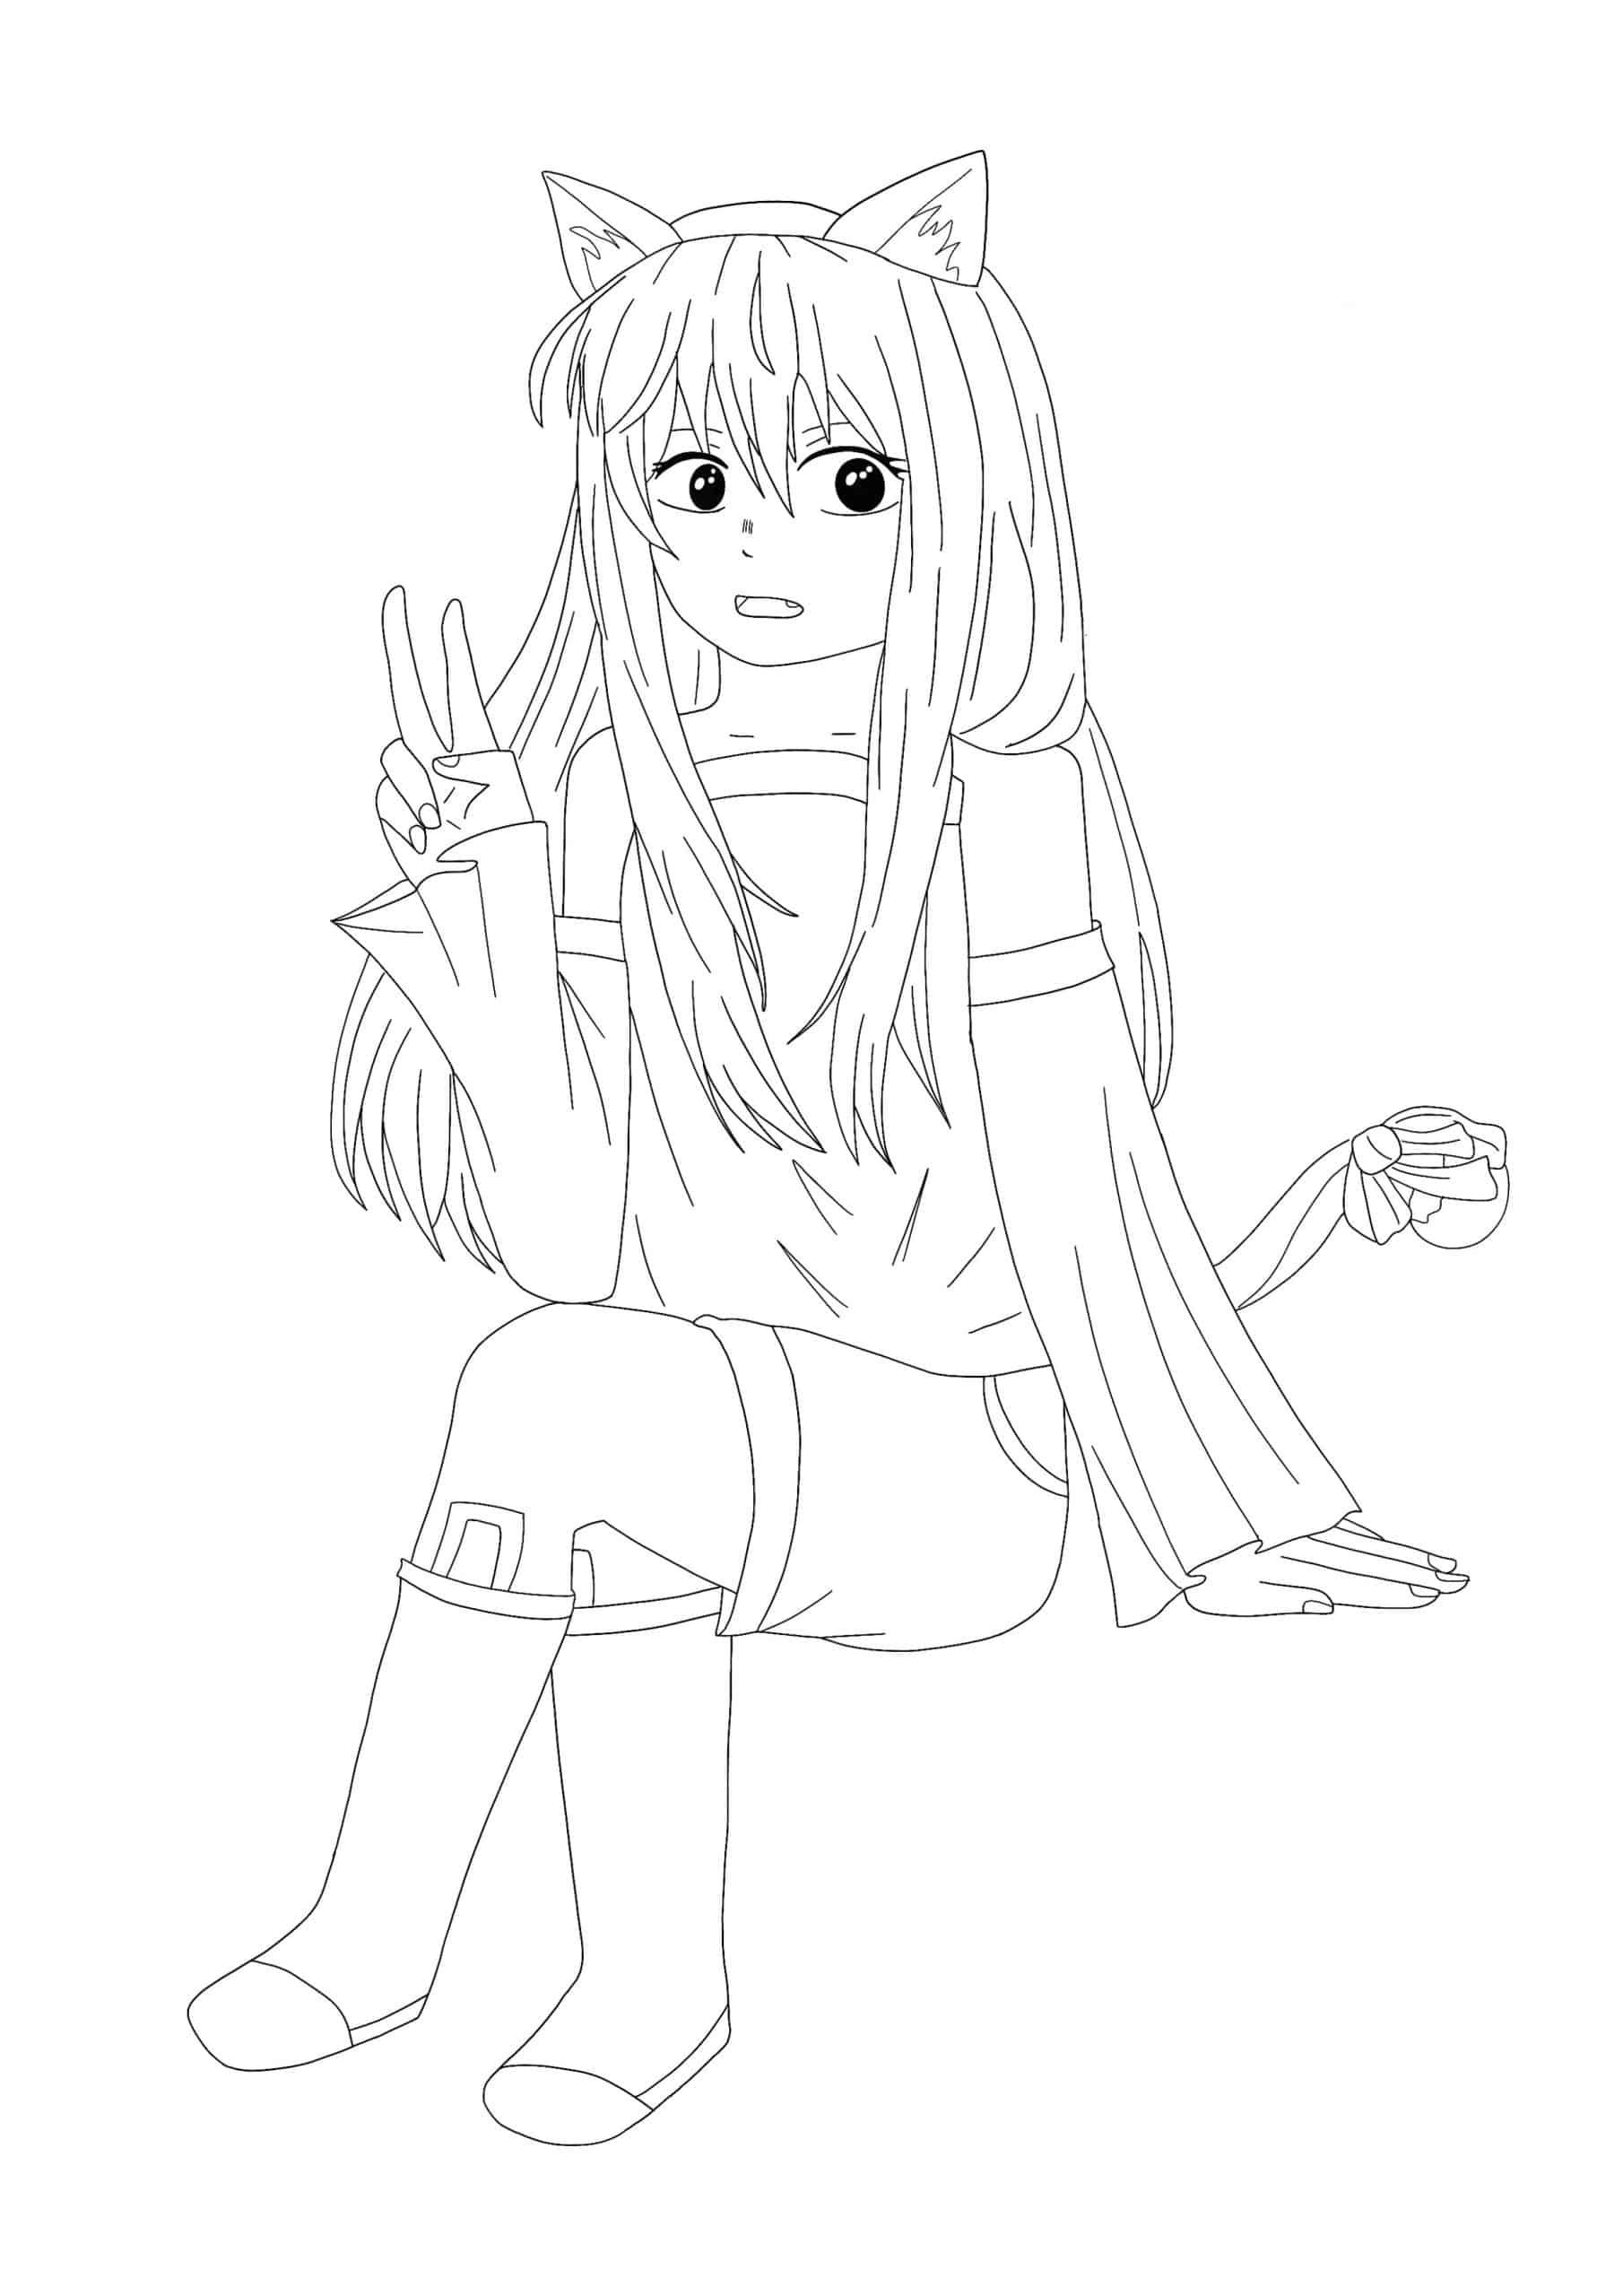 Kawaii Anime Coloring Pages 6 Free Printable Coloring Sheets 2020